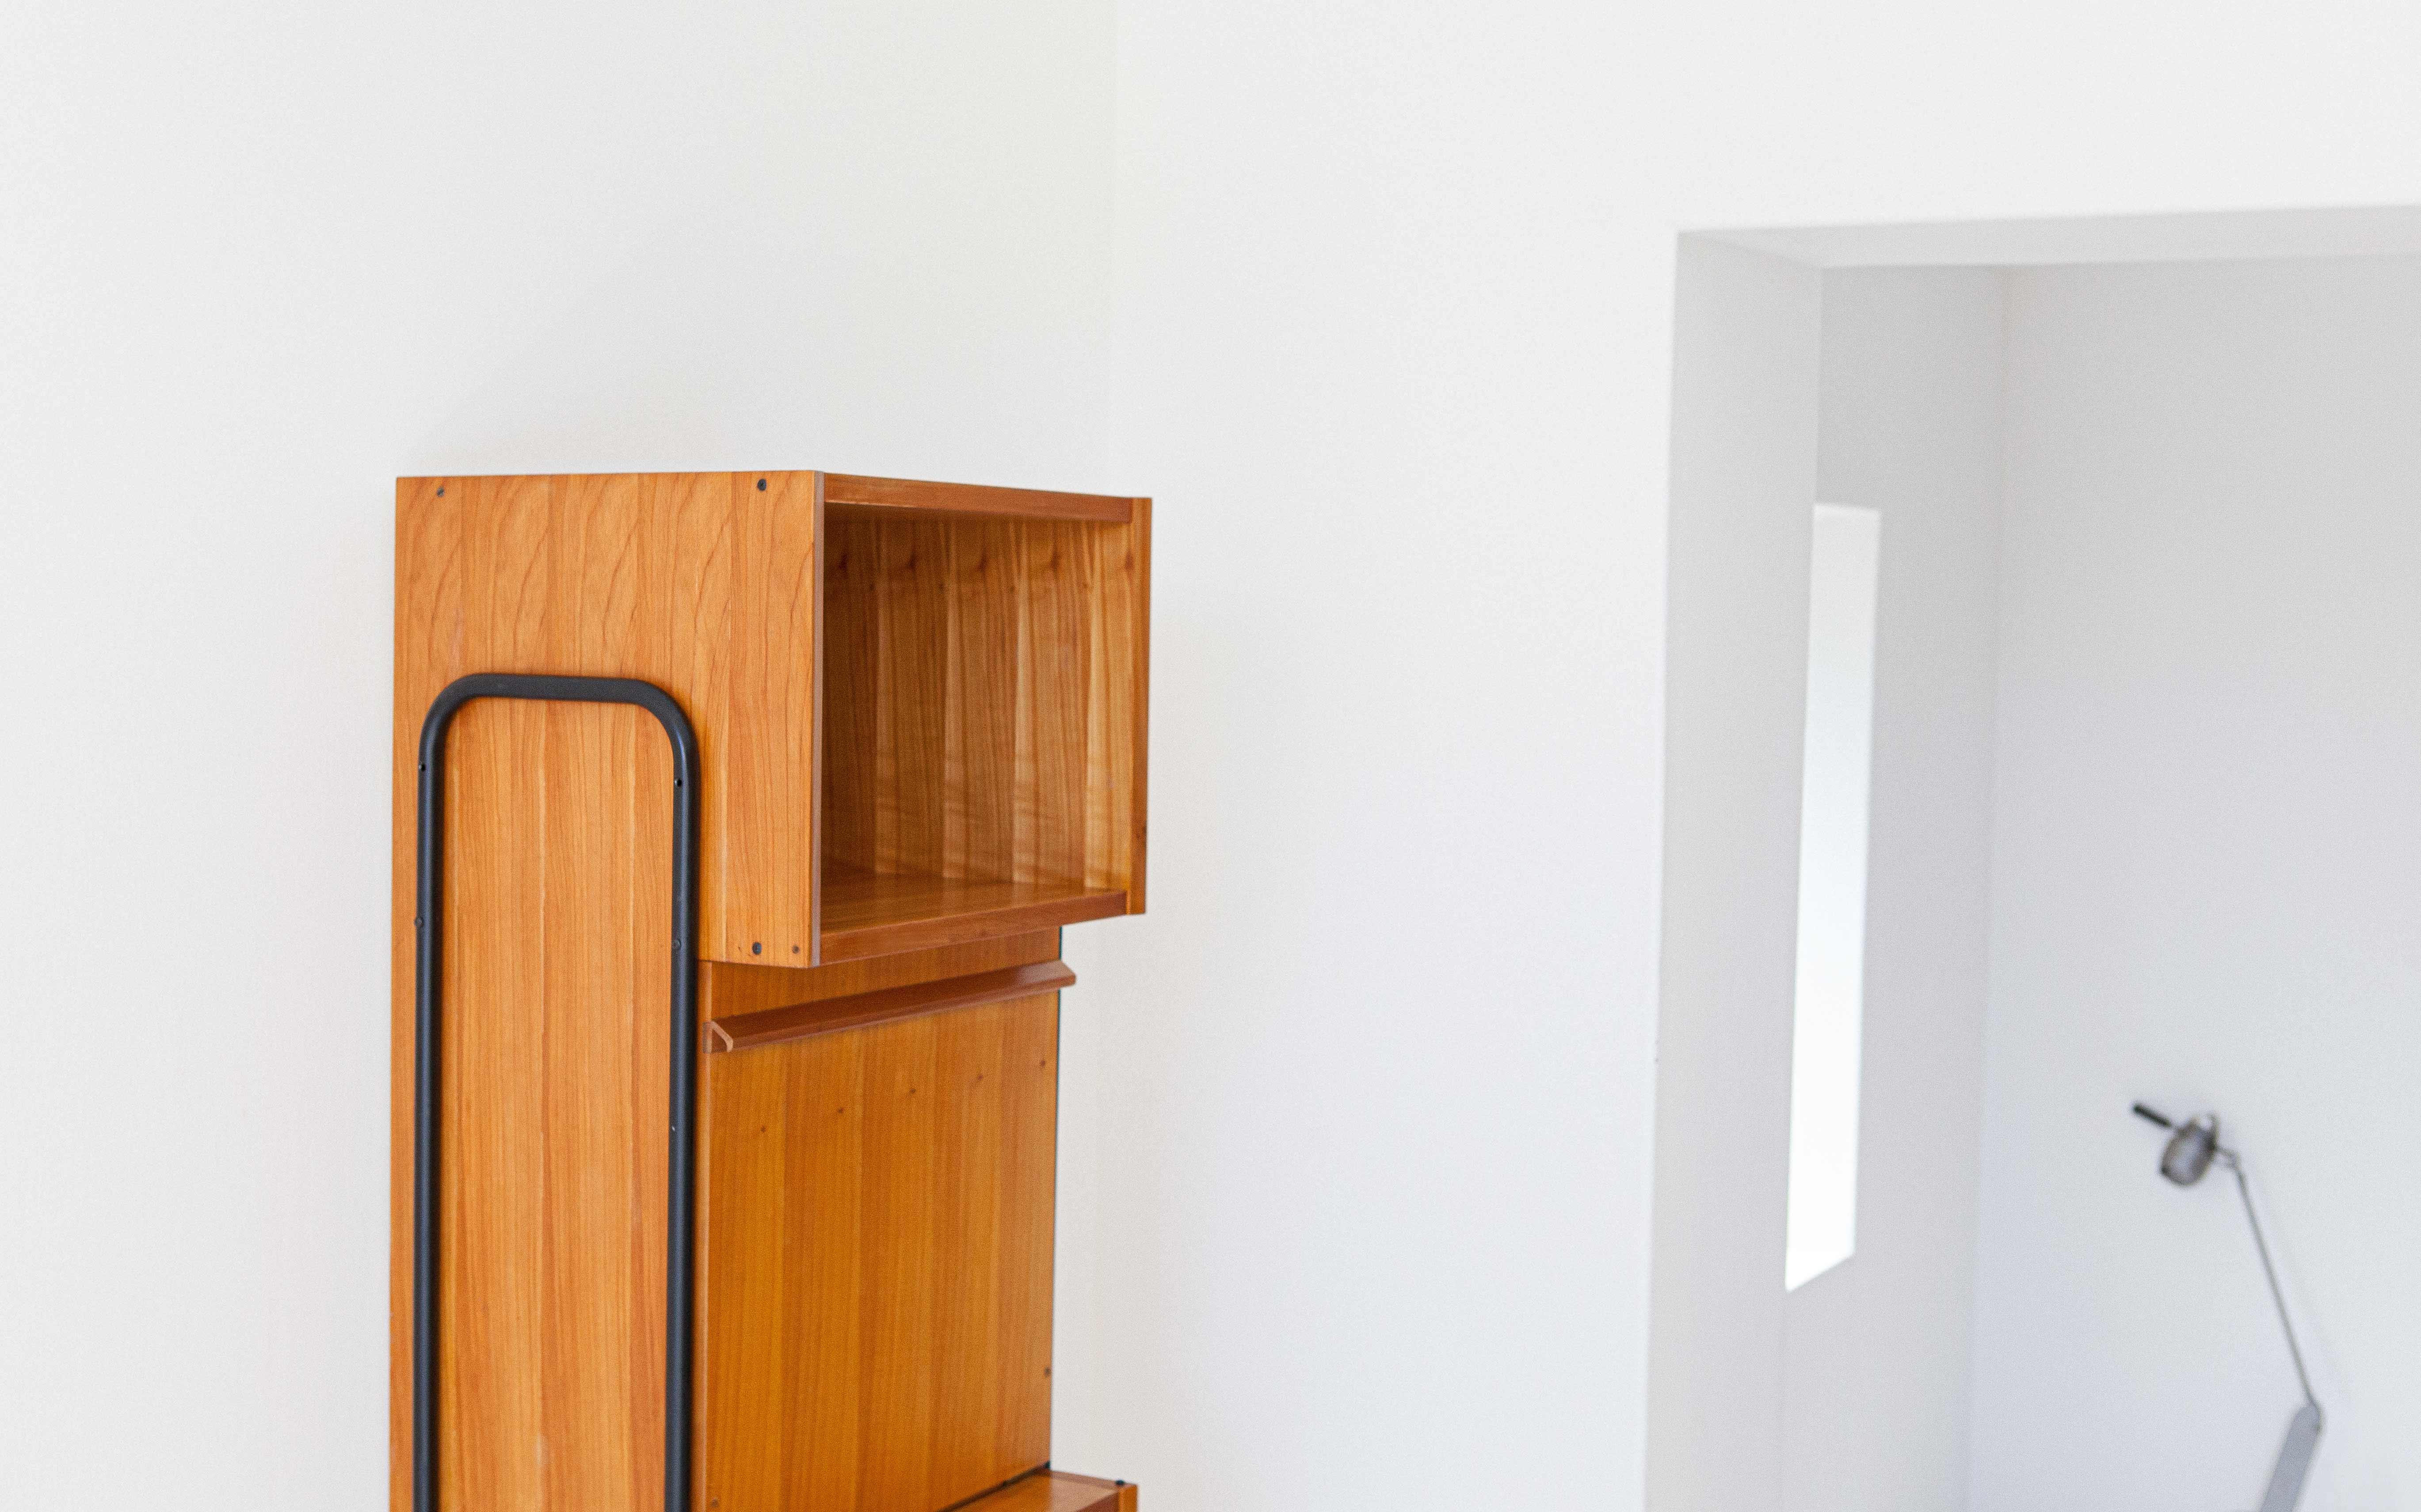 1950s-italian-light-wood-and-iron-wardrobe-cabinet--st115